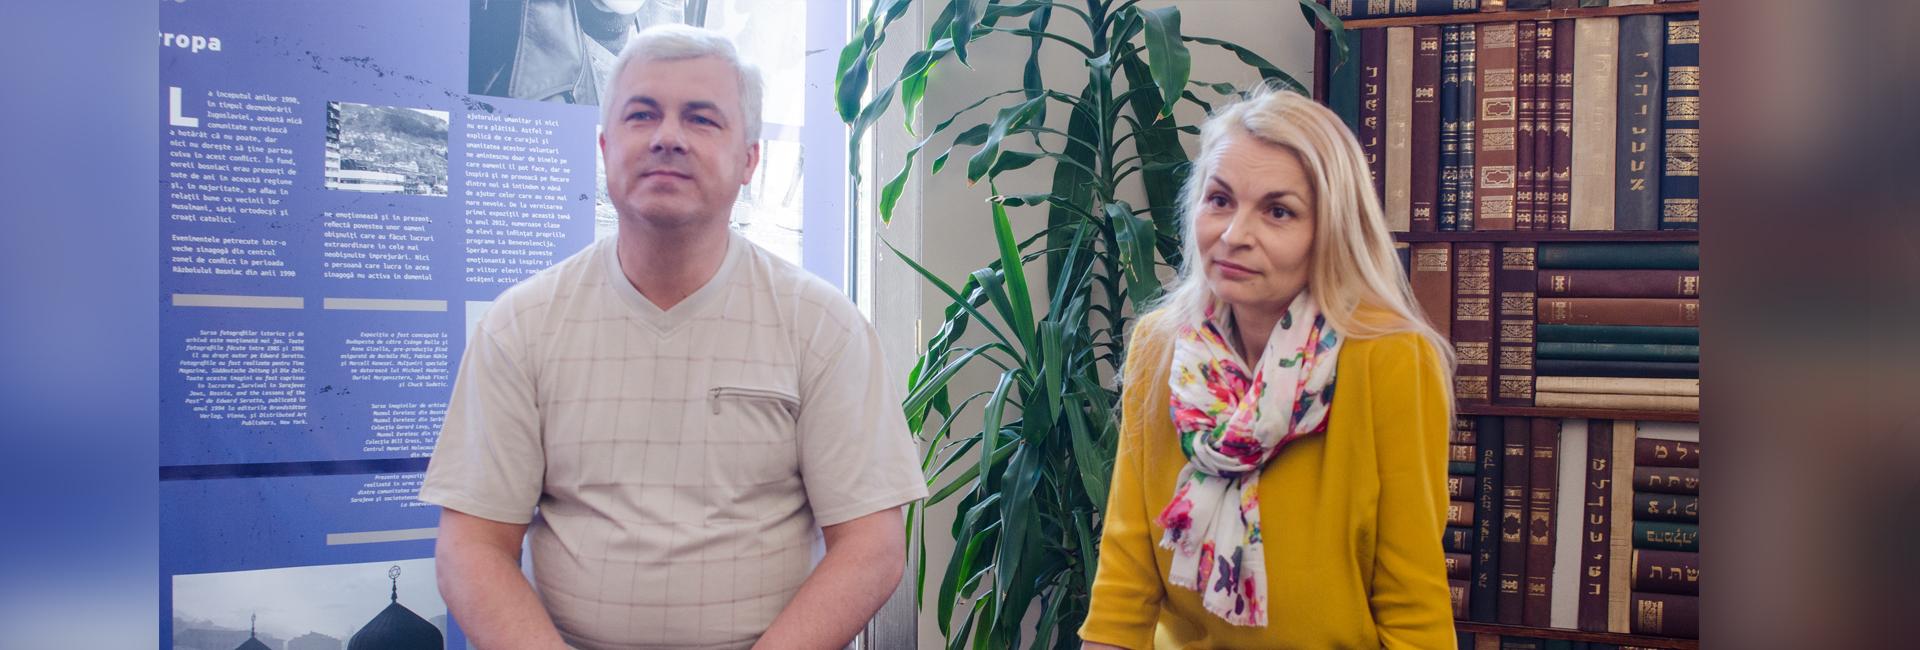 actorii Ludmila Gheorghiţă şi Ion Grosu Basarabia Chişinău româneşte limba română slider